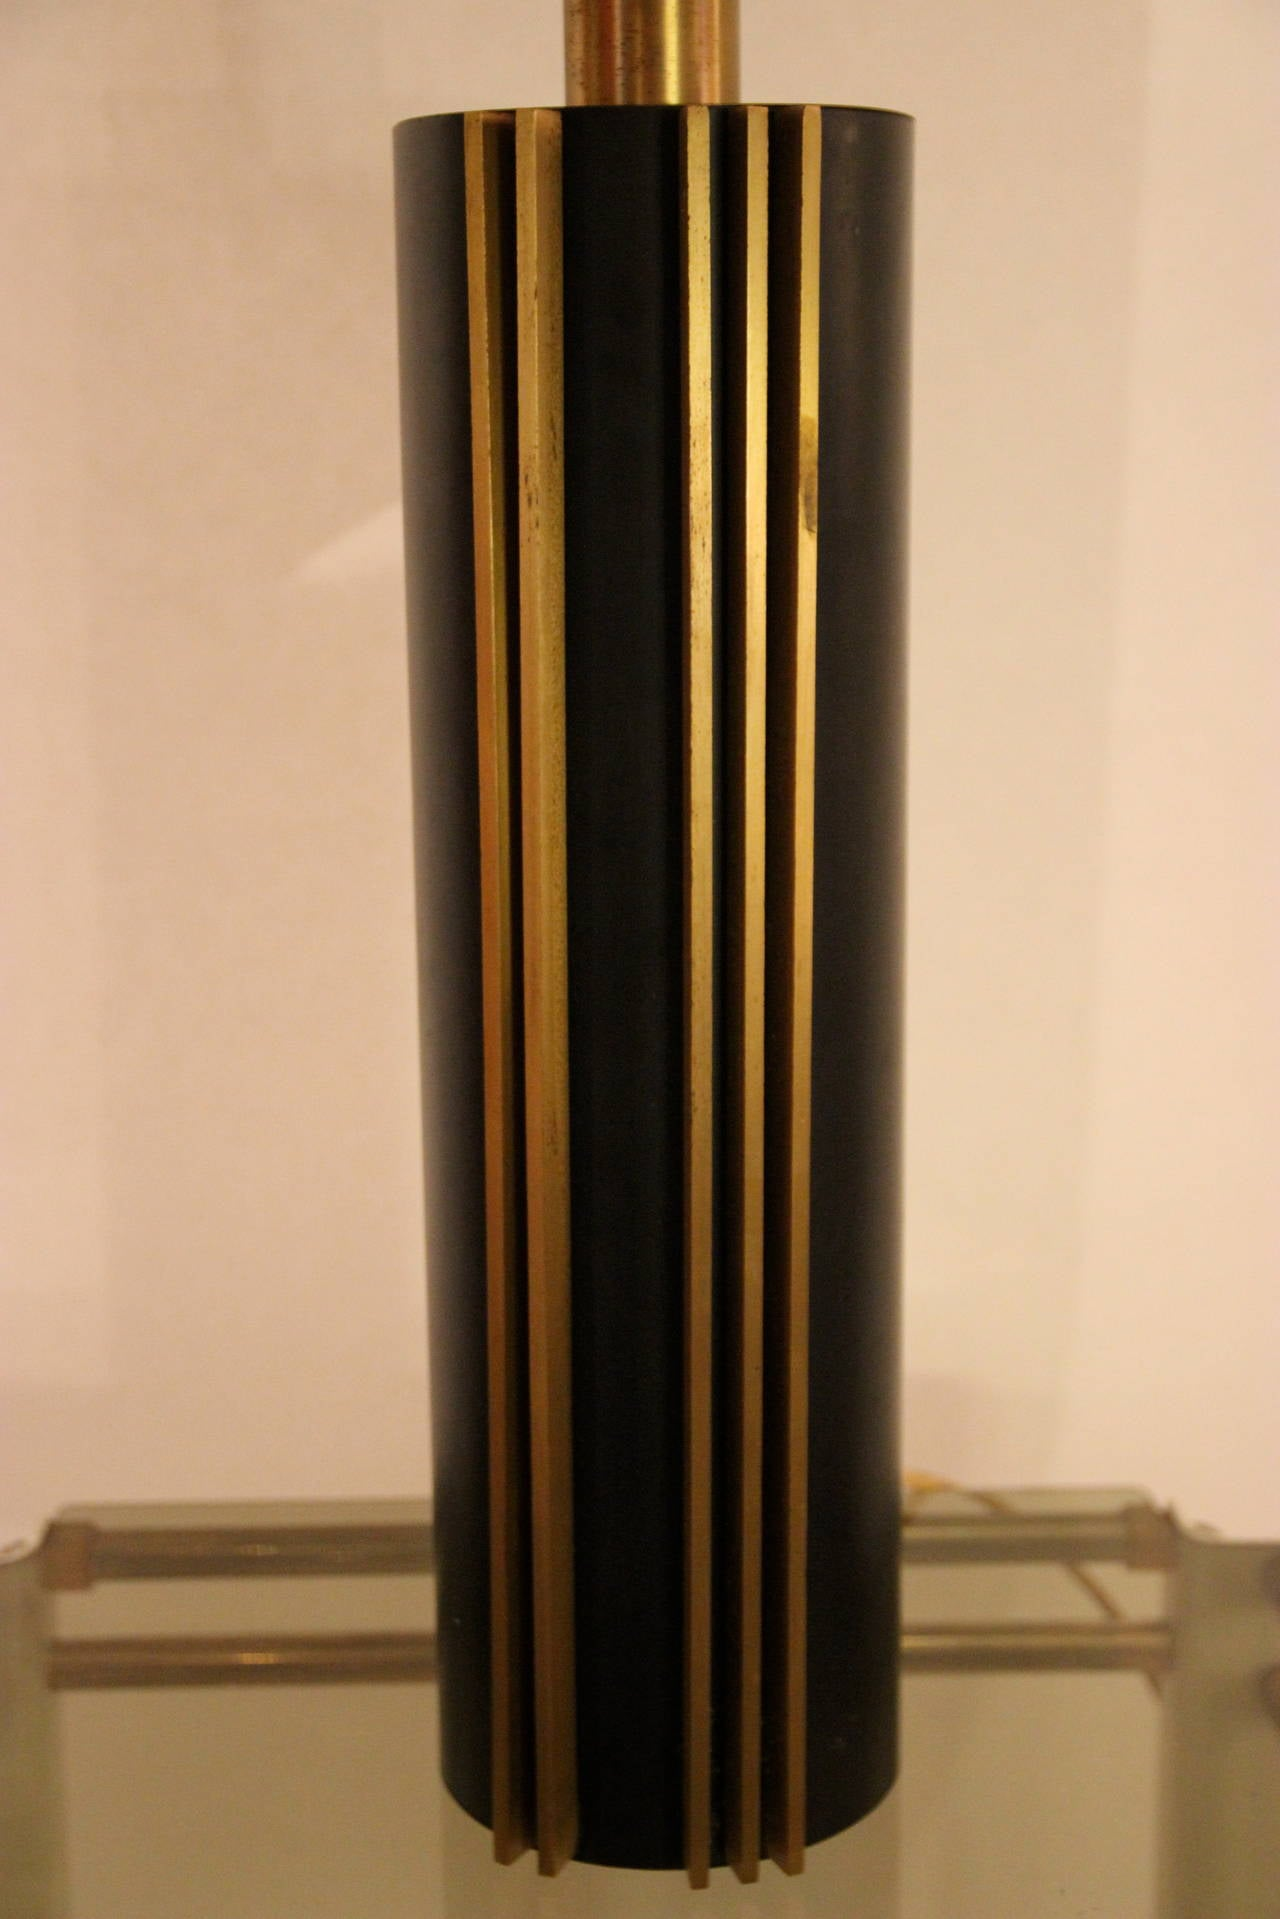 Italian Angelo Brotto Style Table Lamp circa 1970 Italy, Esperia Edition For Sale